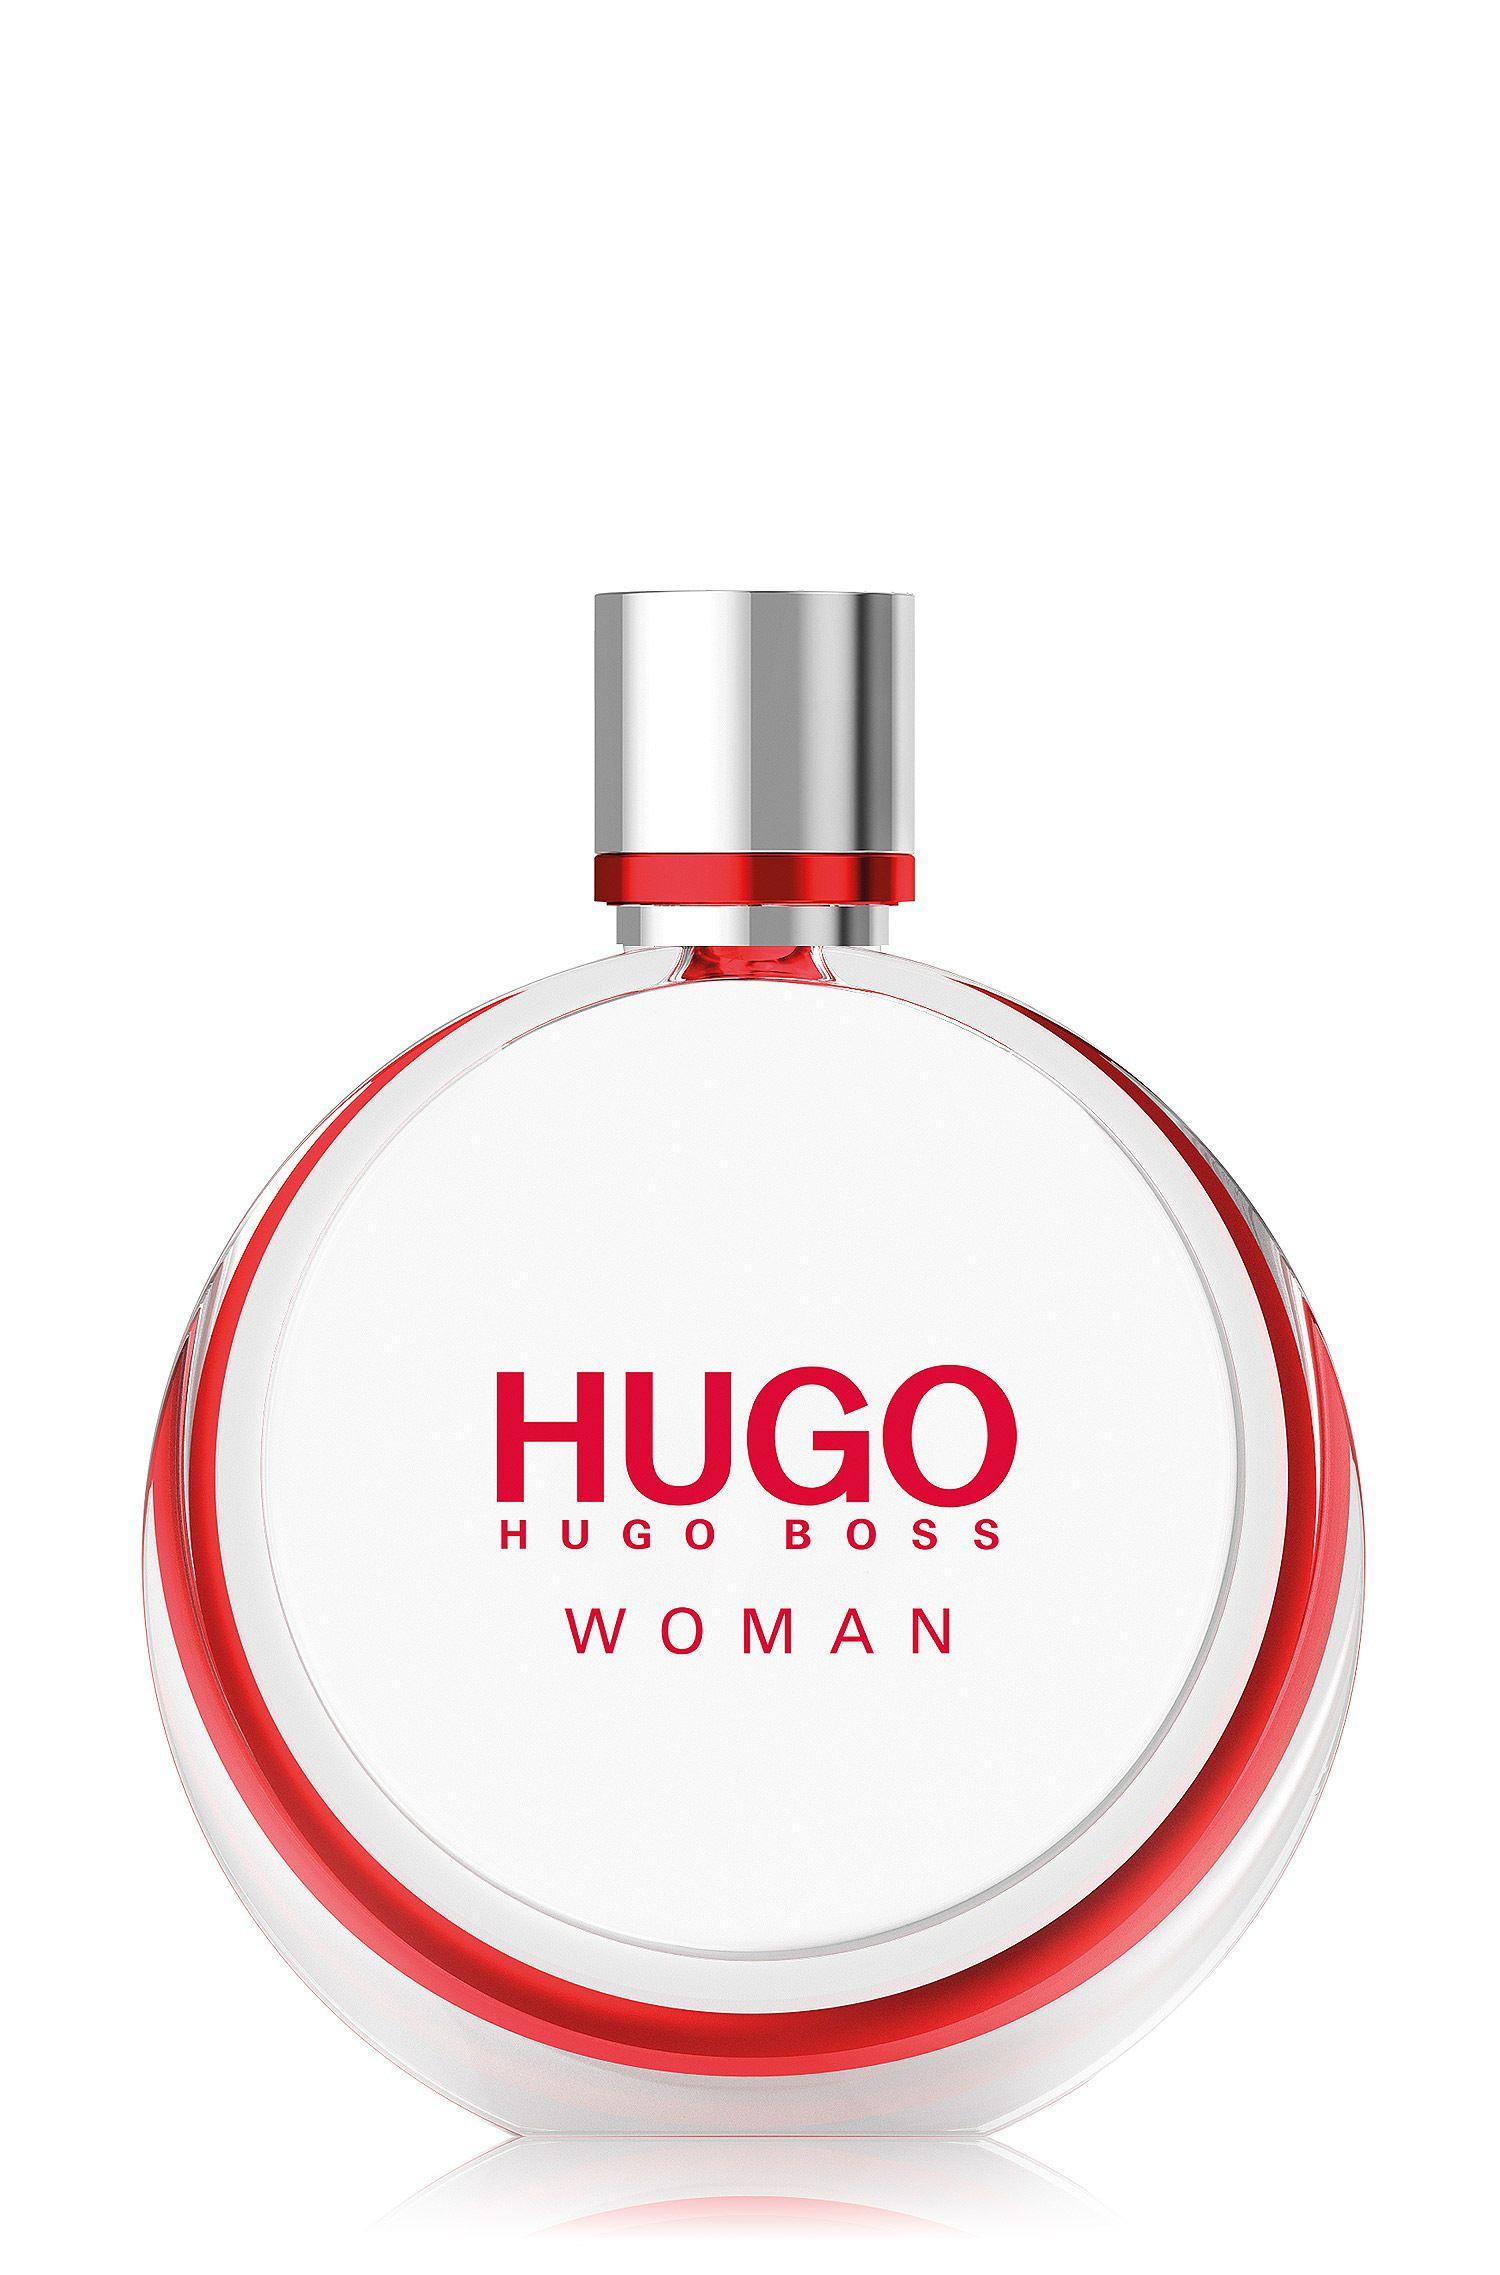 2.5 oz (75 mL) Eau de Parfum | HUGO Woman